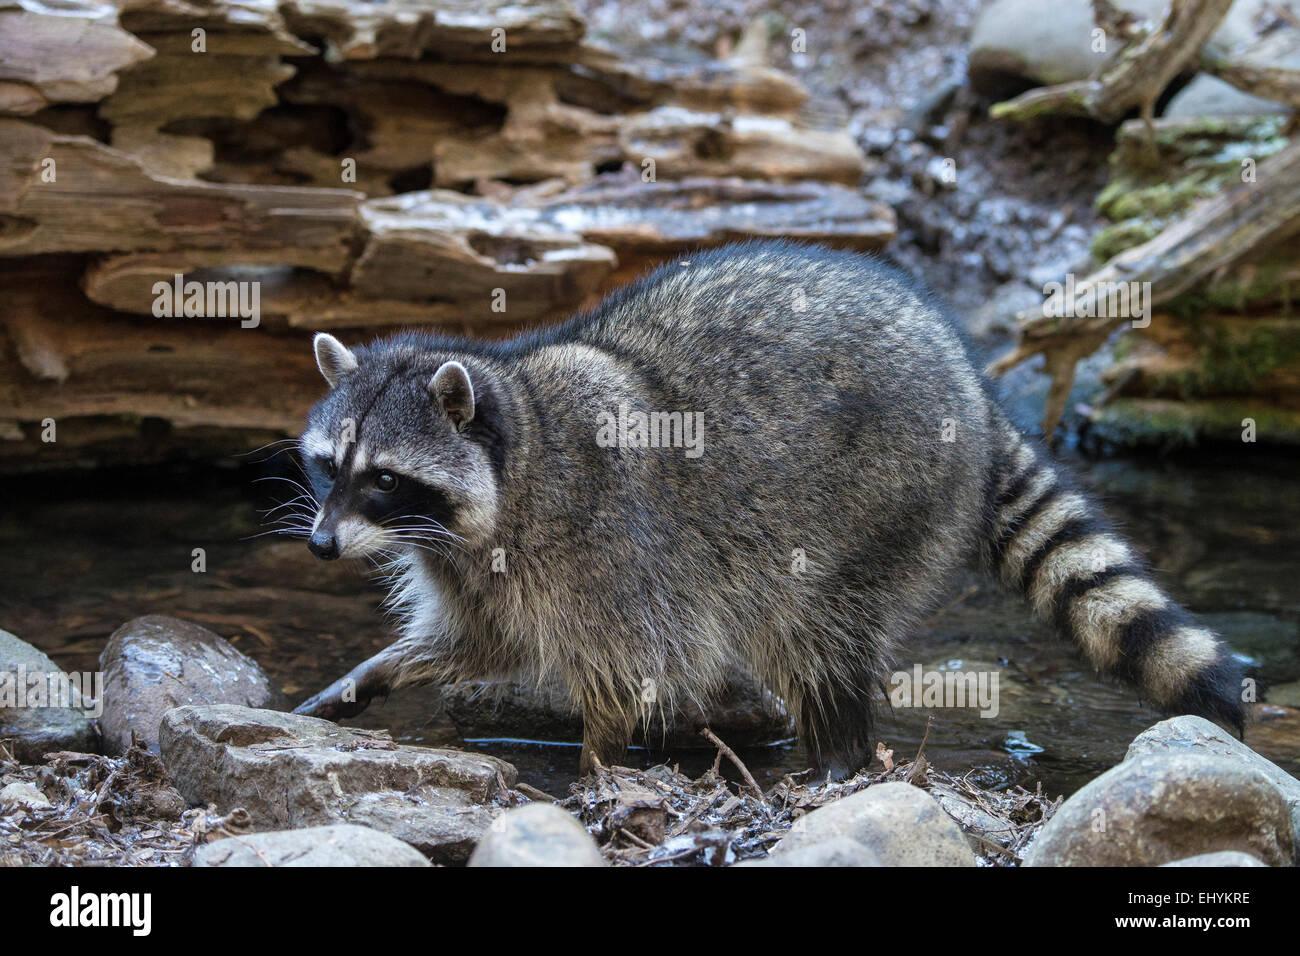 Ouaouaron, Rana catesbeiana, animal, USA, United States, Amérique, Photo Stock